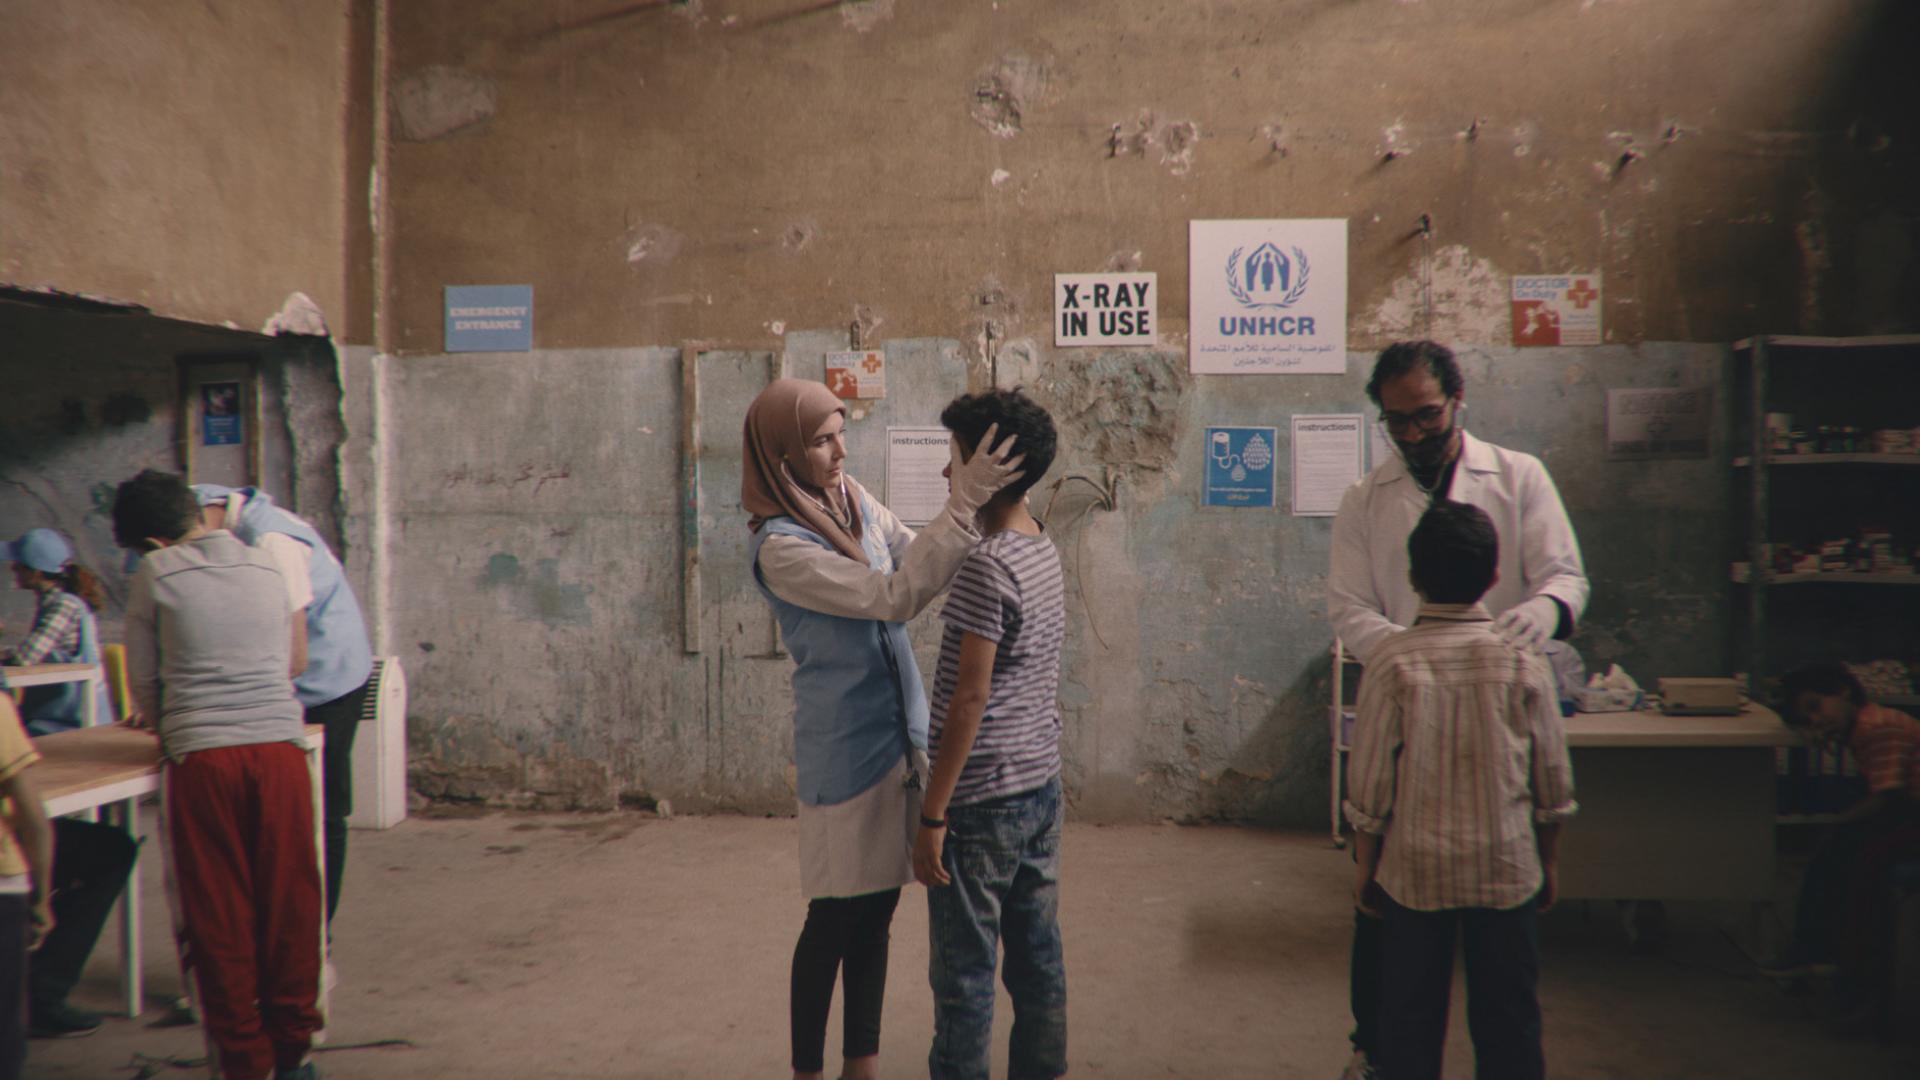 UNHCR's Ramadan Campaign Spotlights The Journeys Of Three Refugees